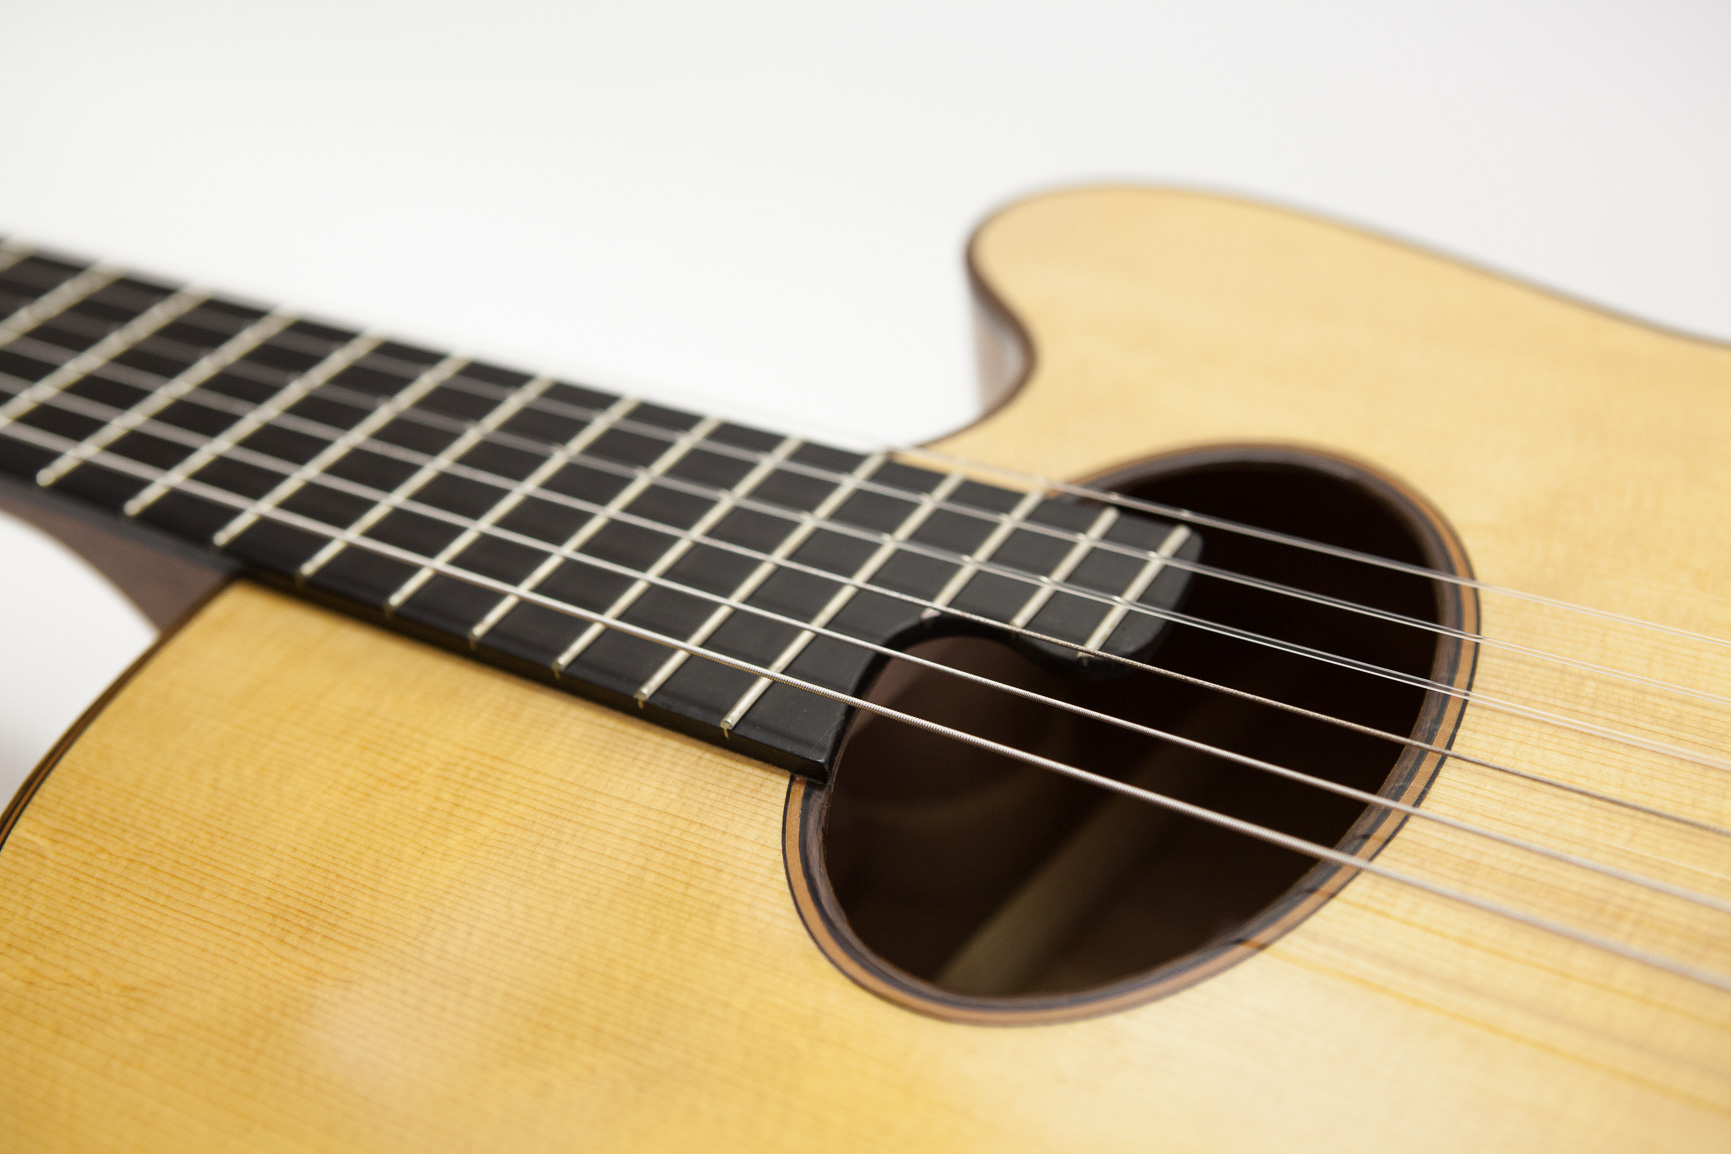 Konzertgitarre mit Cutaway